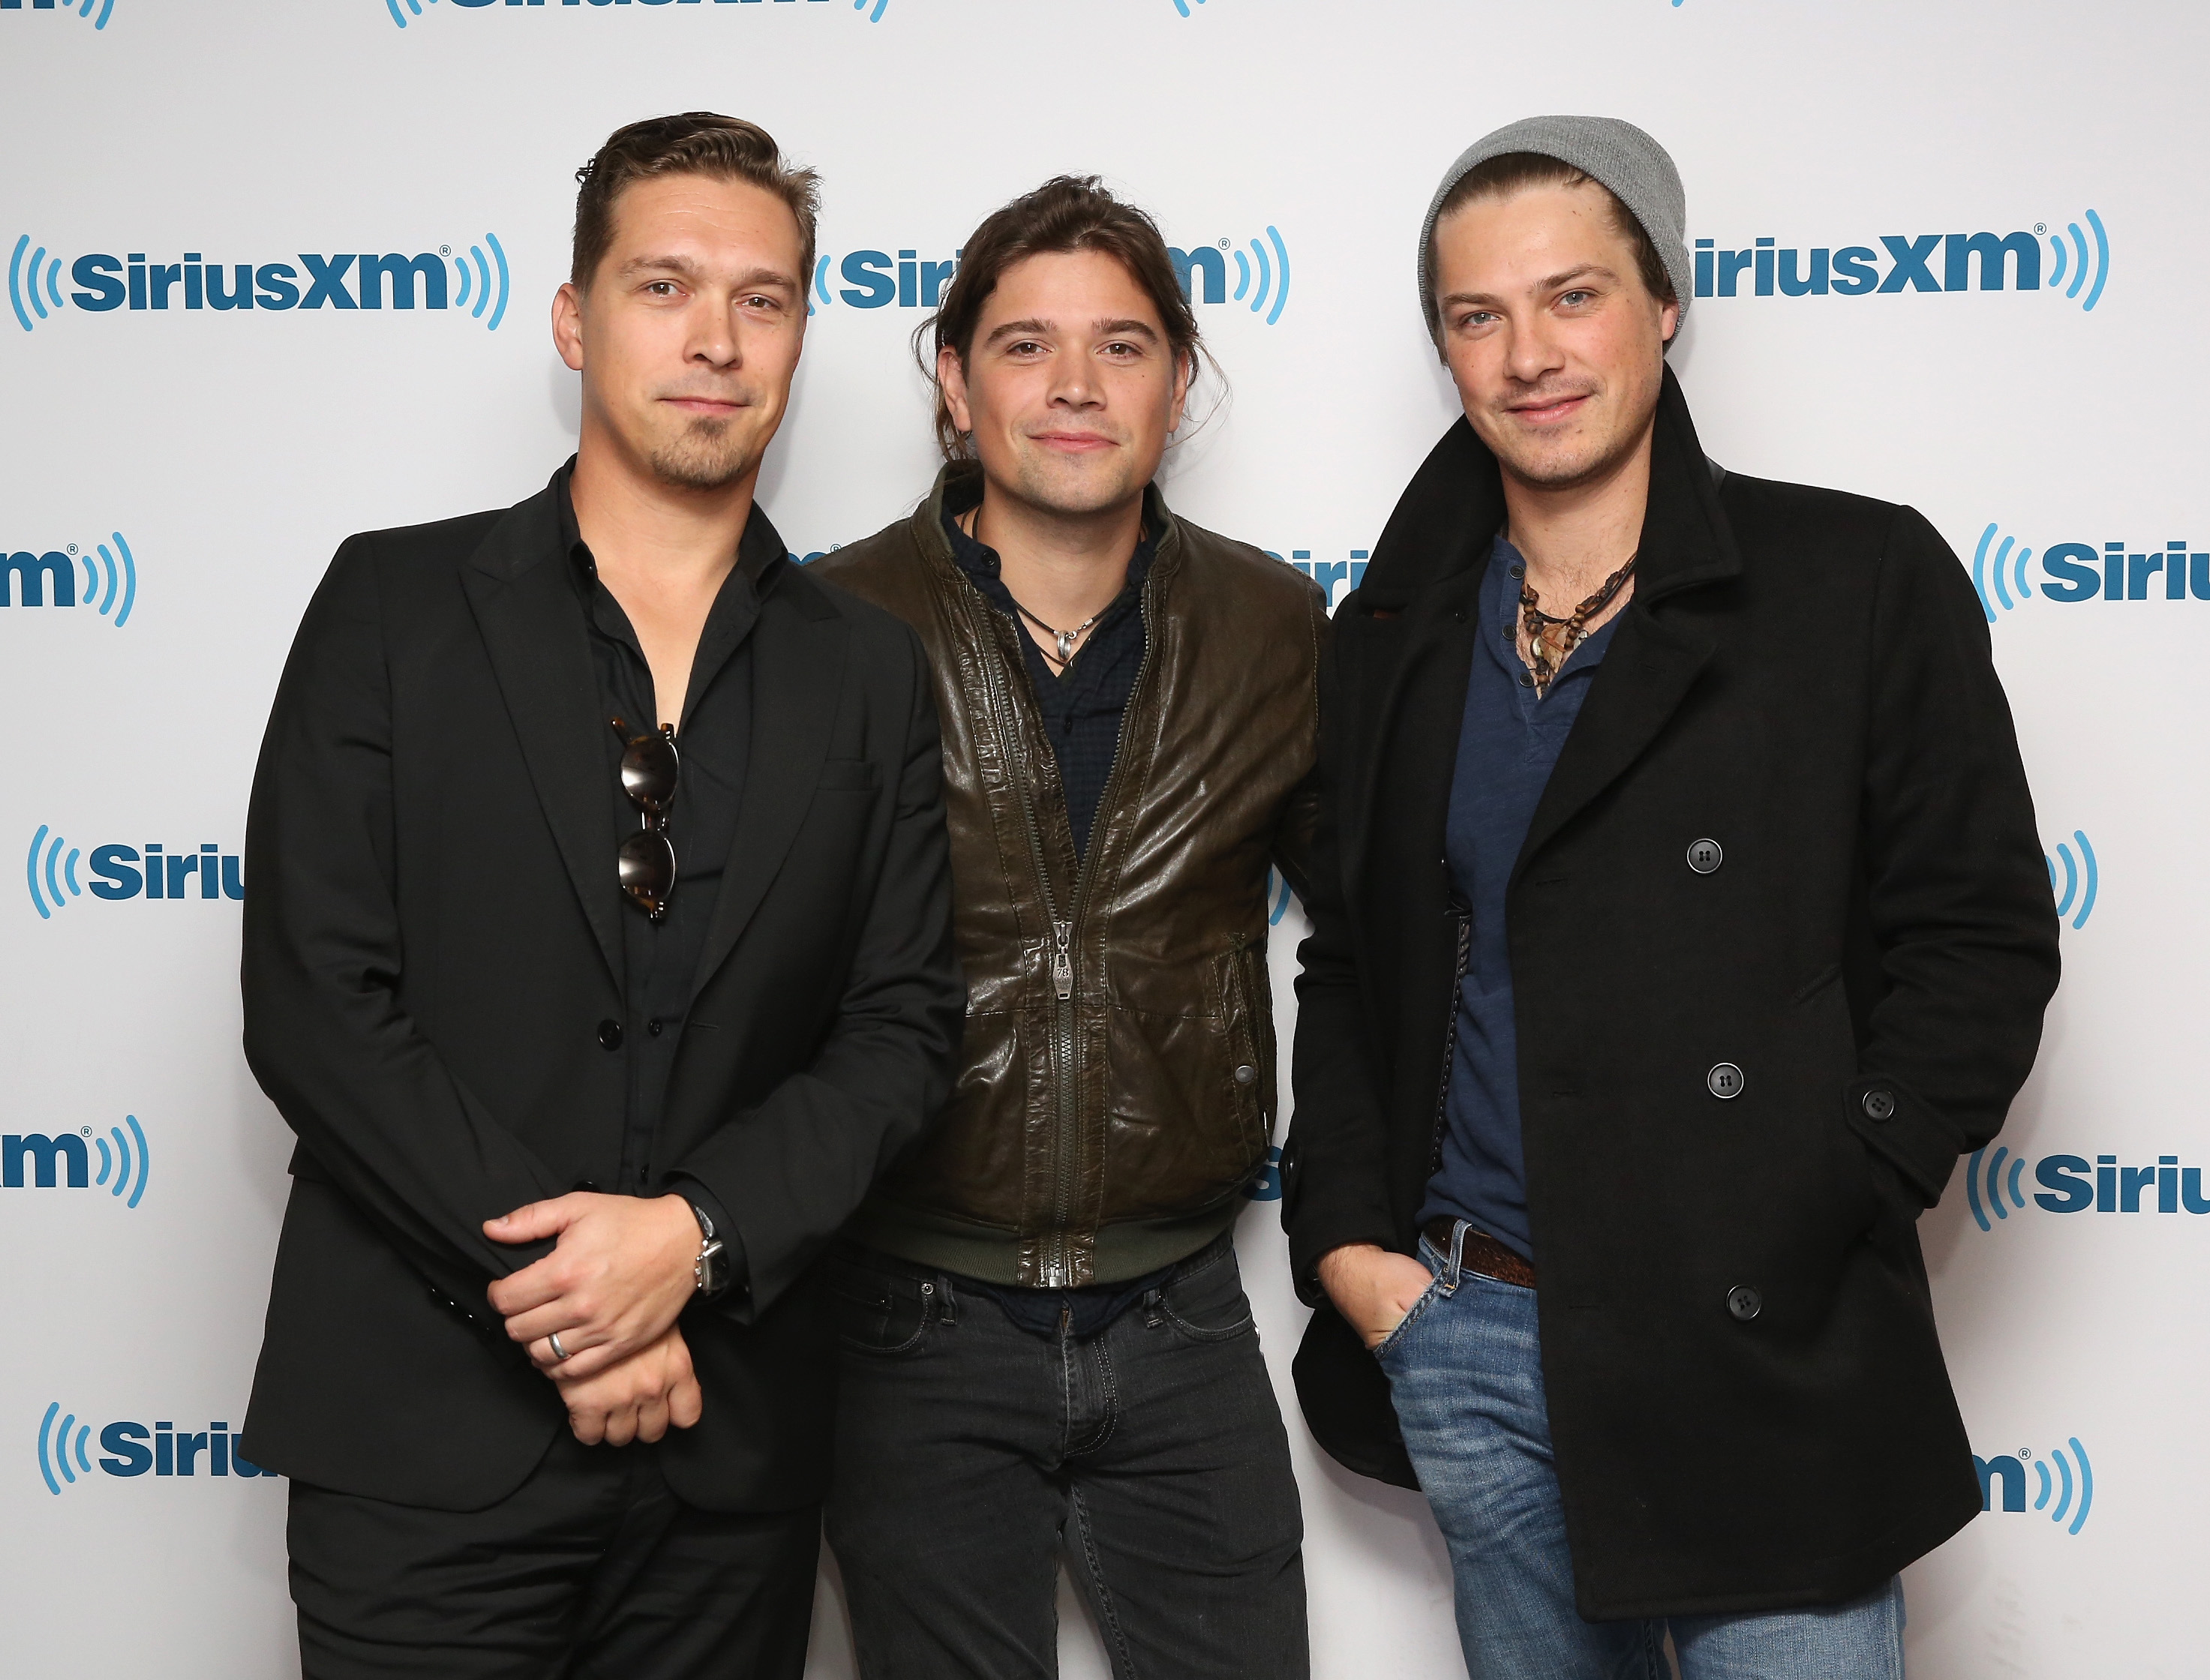 Isaac Hanson, Zac Hanson and Taylor Hanson of Hanson visit at SiriusXM Studios on October 16, 2015 in New York City.